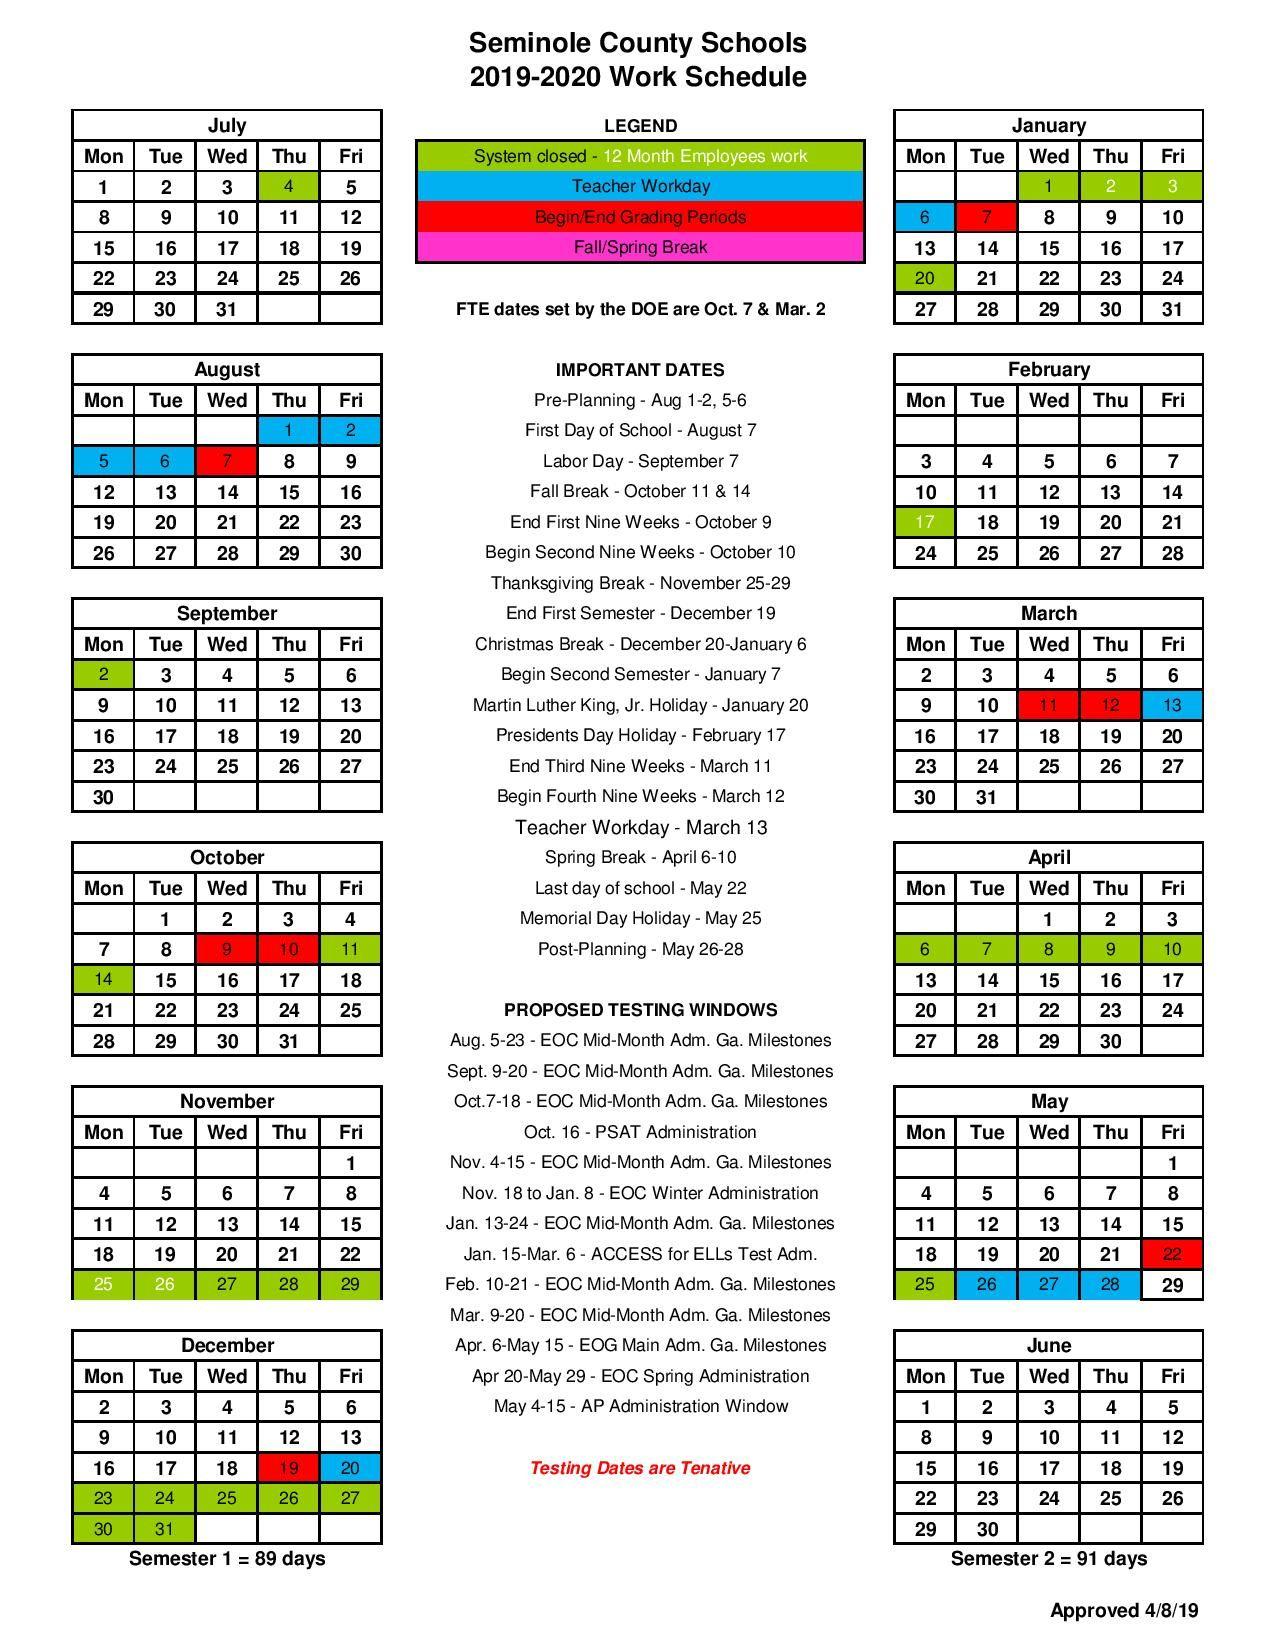 Seminole County Public Schools Calendar 2021 | 2021 Calendar with L Victorville School Distict Canlendar 2020-2021 For What Schools